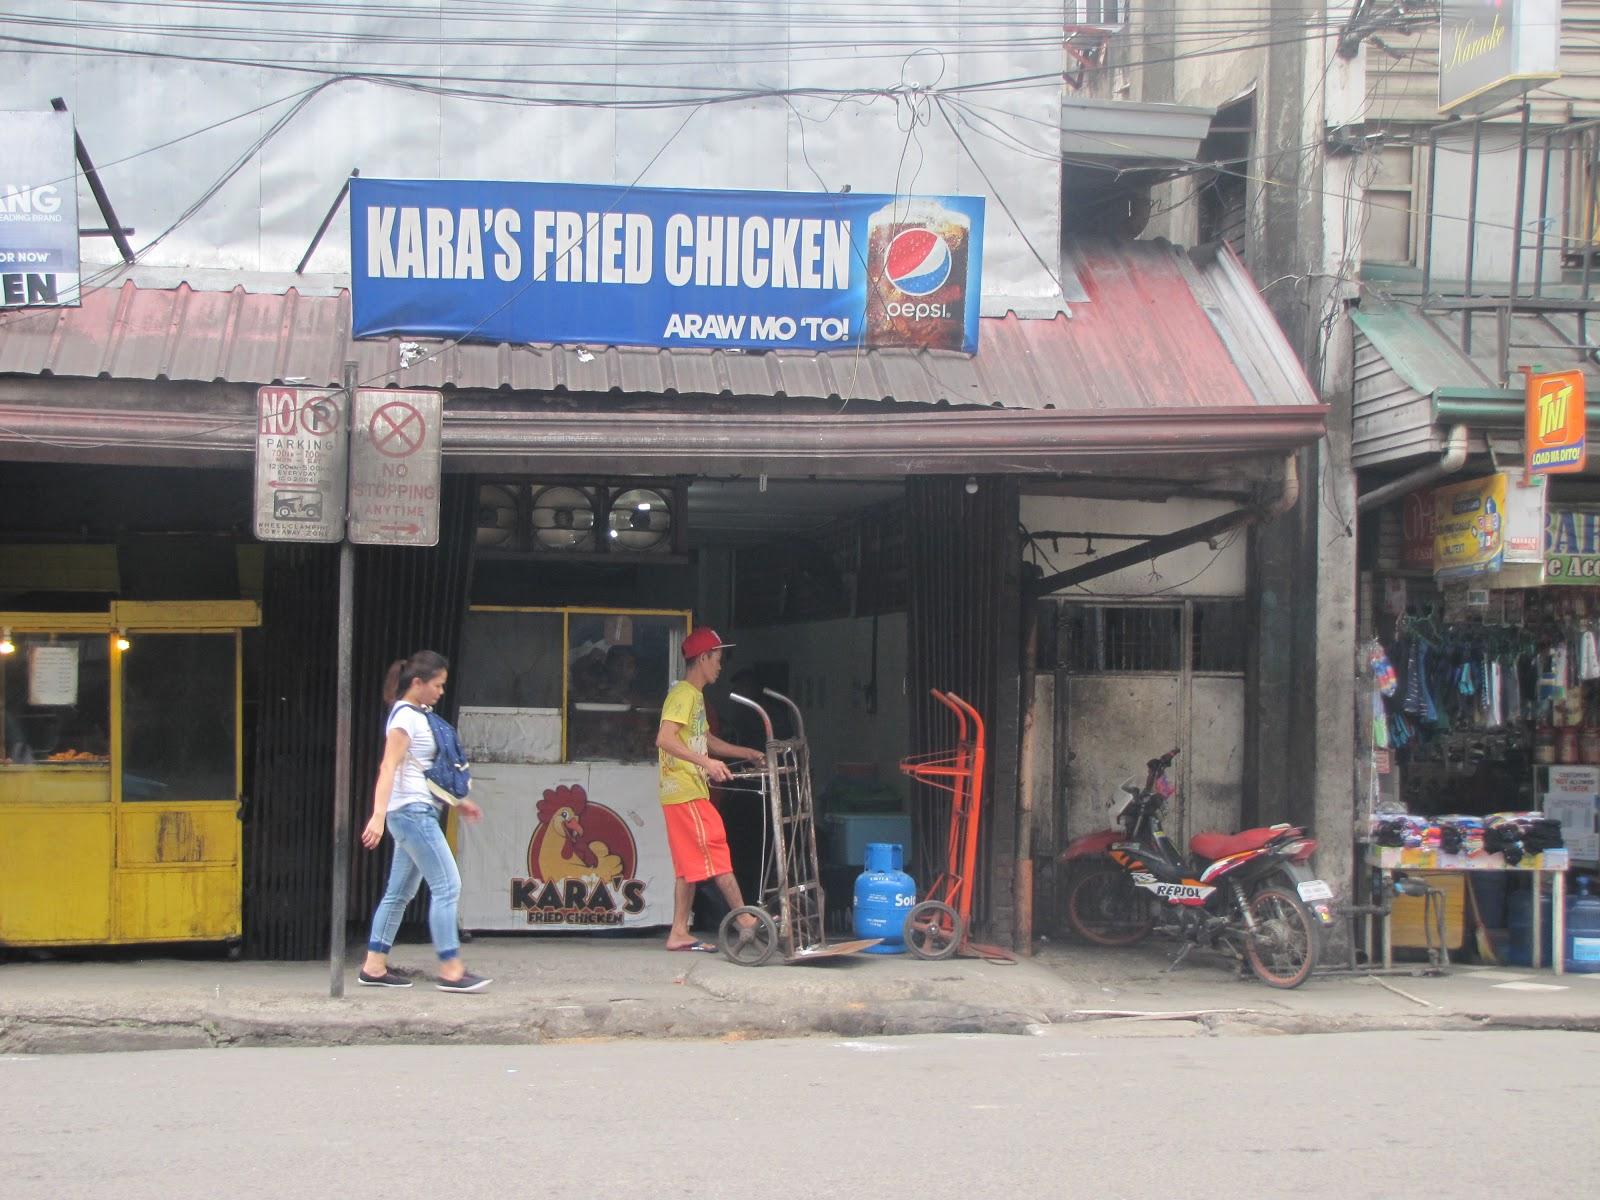 FTW! Blog, Kara's Fried Chicken, #FTWBlog #FTWeats #FTWtravels #032eatdrink #ghettogrub www.zhequia.com #ZhequiaDOTcom